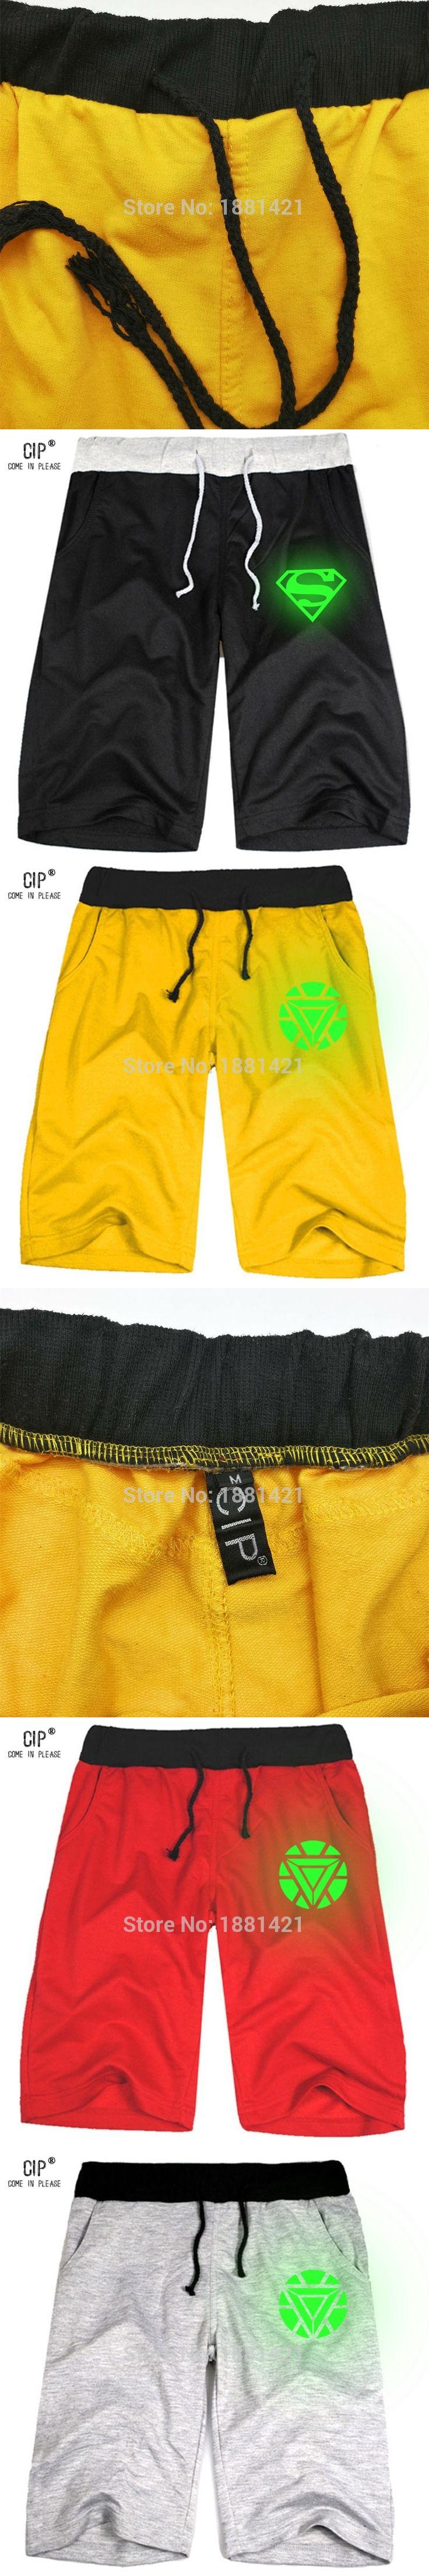 CIP Neon Superman Glow in Dark Brand-clothing Summer Leisure Sporting Shorts Men Trousers Outer Wear Men Shorts Gyms Men Fashion